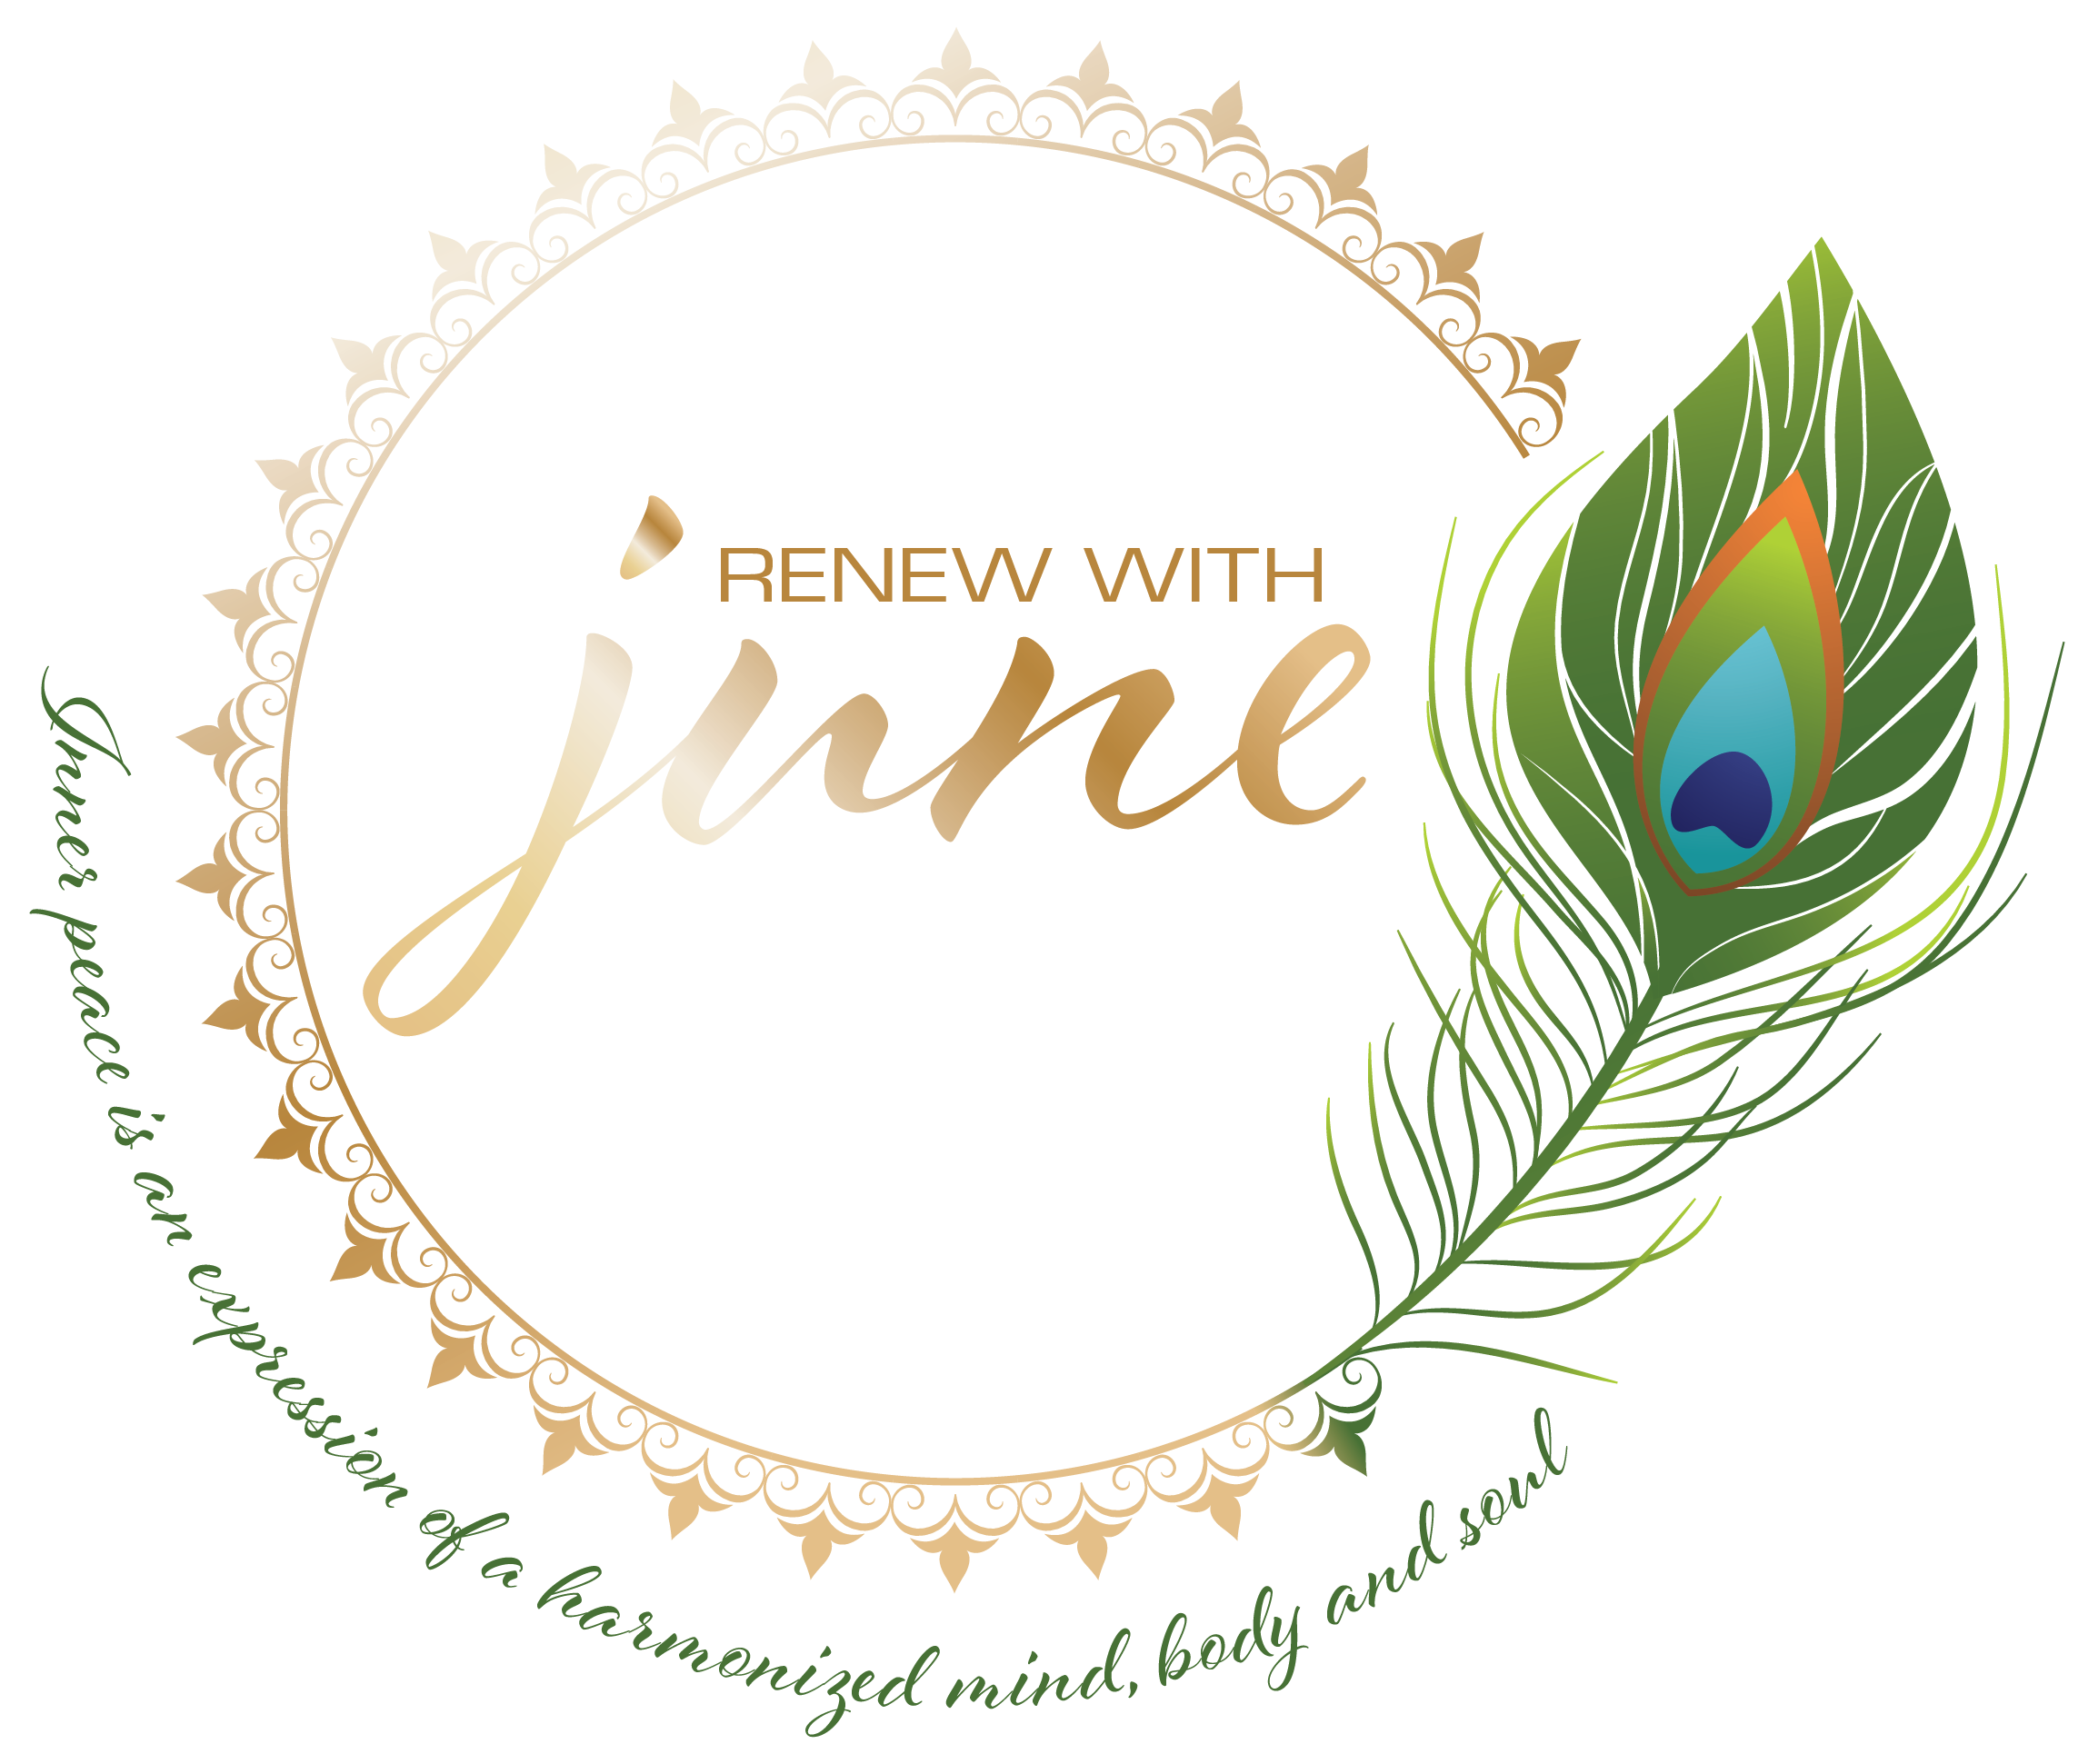 Renew with June